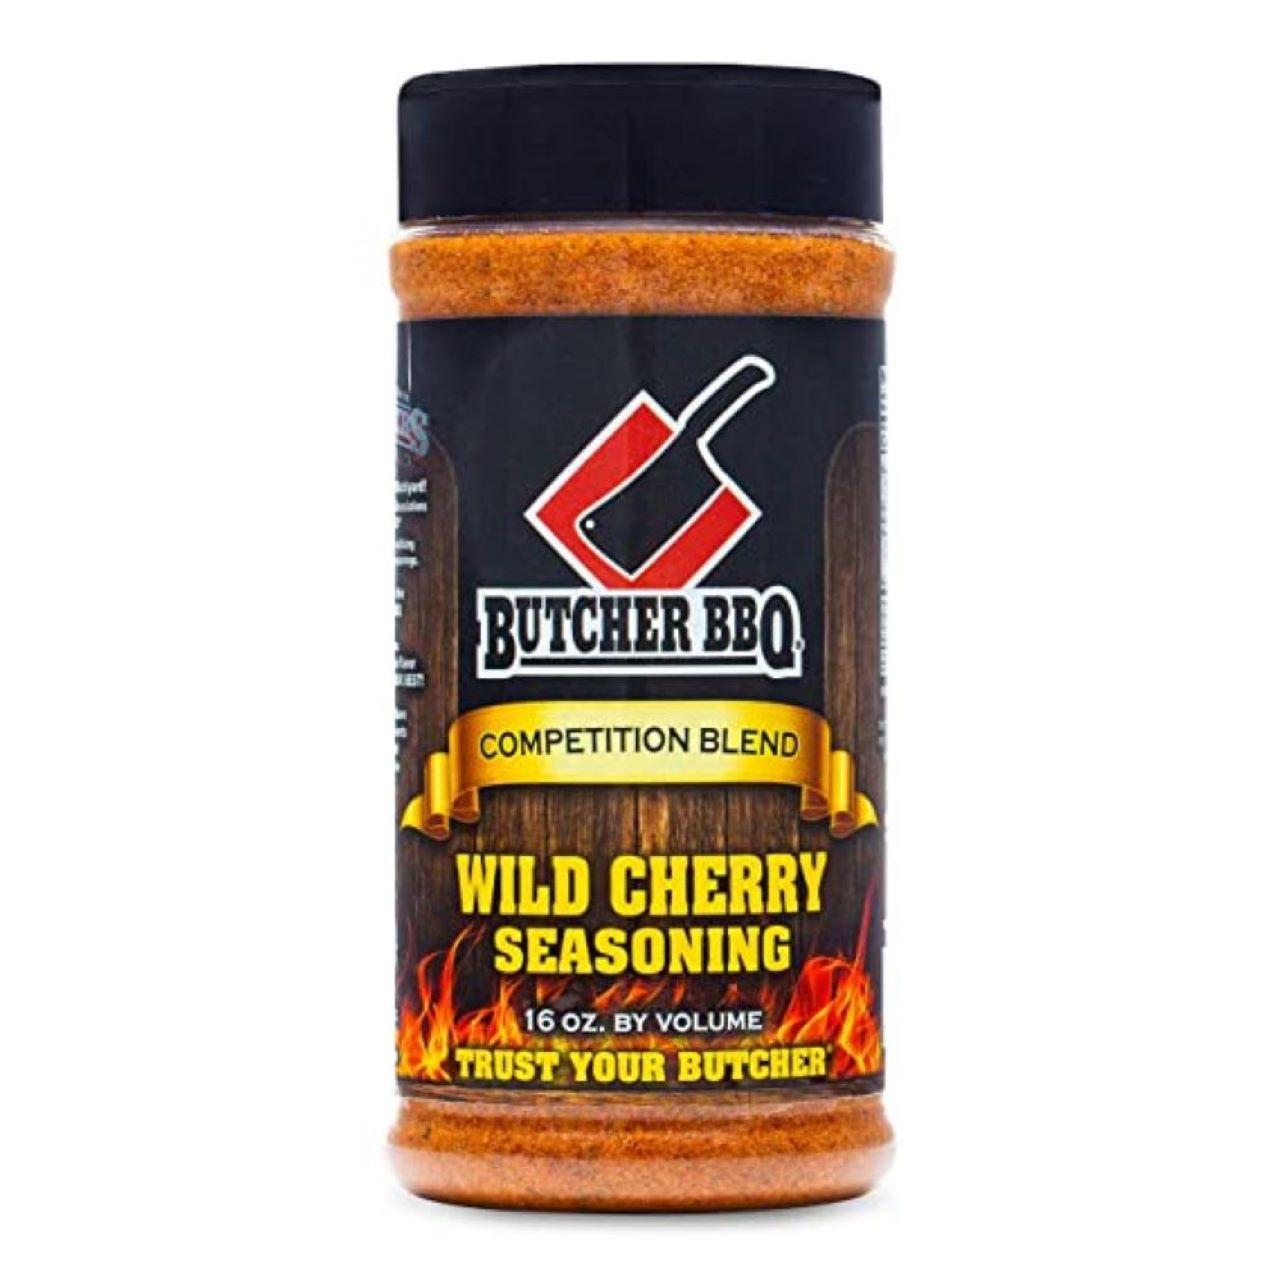 Butcher BBQ 16oz Wild Cherry Rub and Seasoning